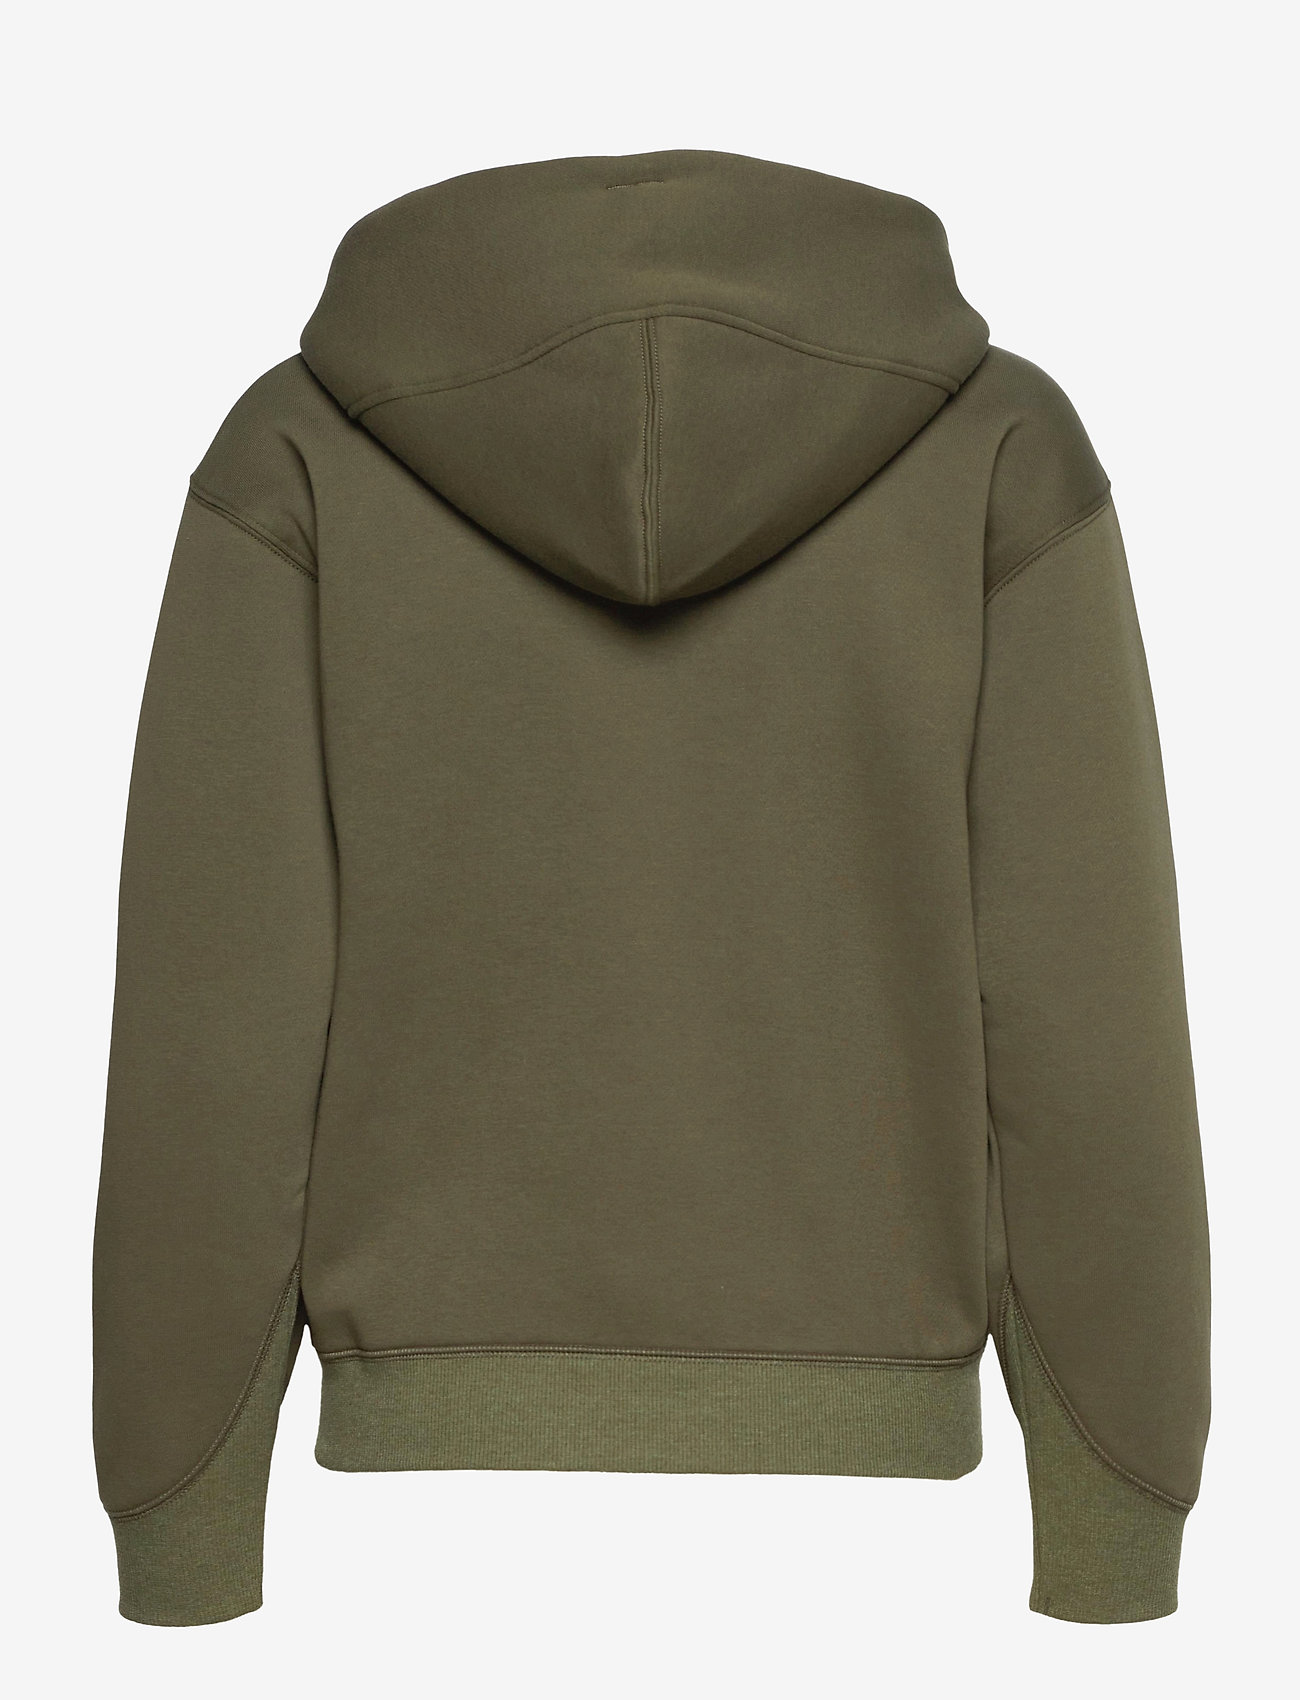 G-star RAW - Premium core hdd zip thru sw wmn l- - hoodies - combat - 1